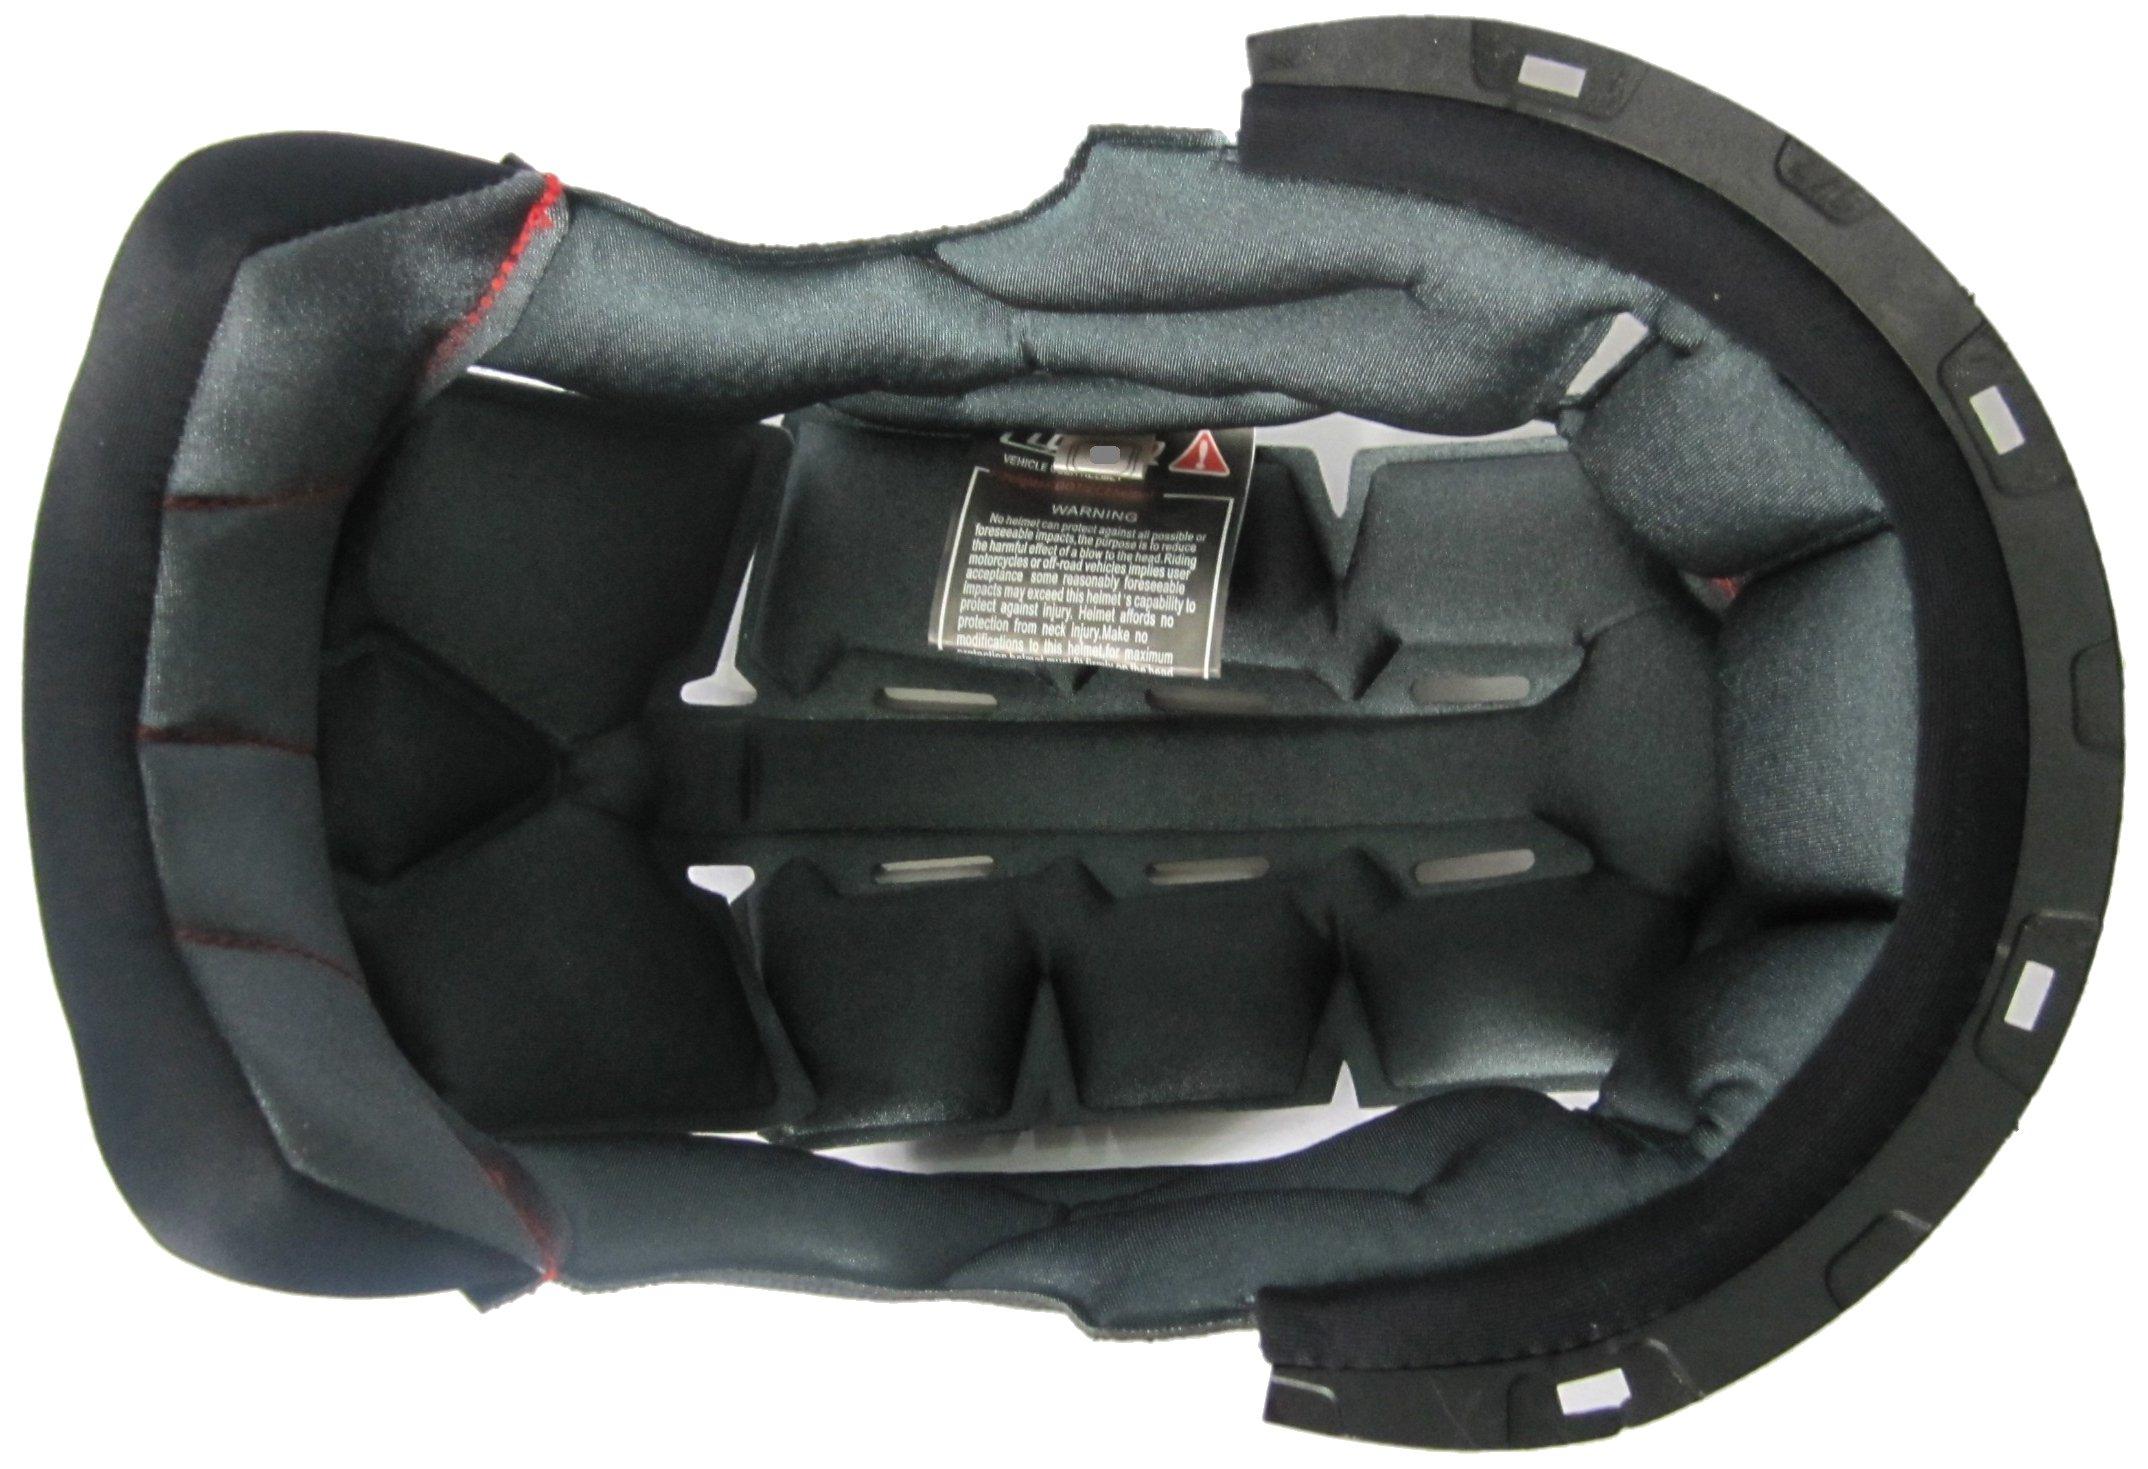 LS2 Helmets Liner for FF385/396 FT2 Helmets (Black, Small)